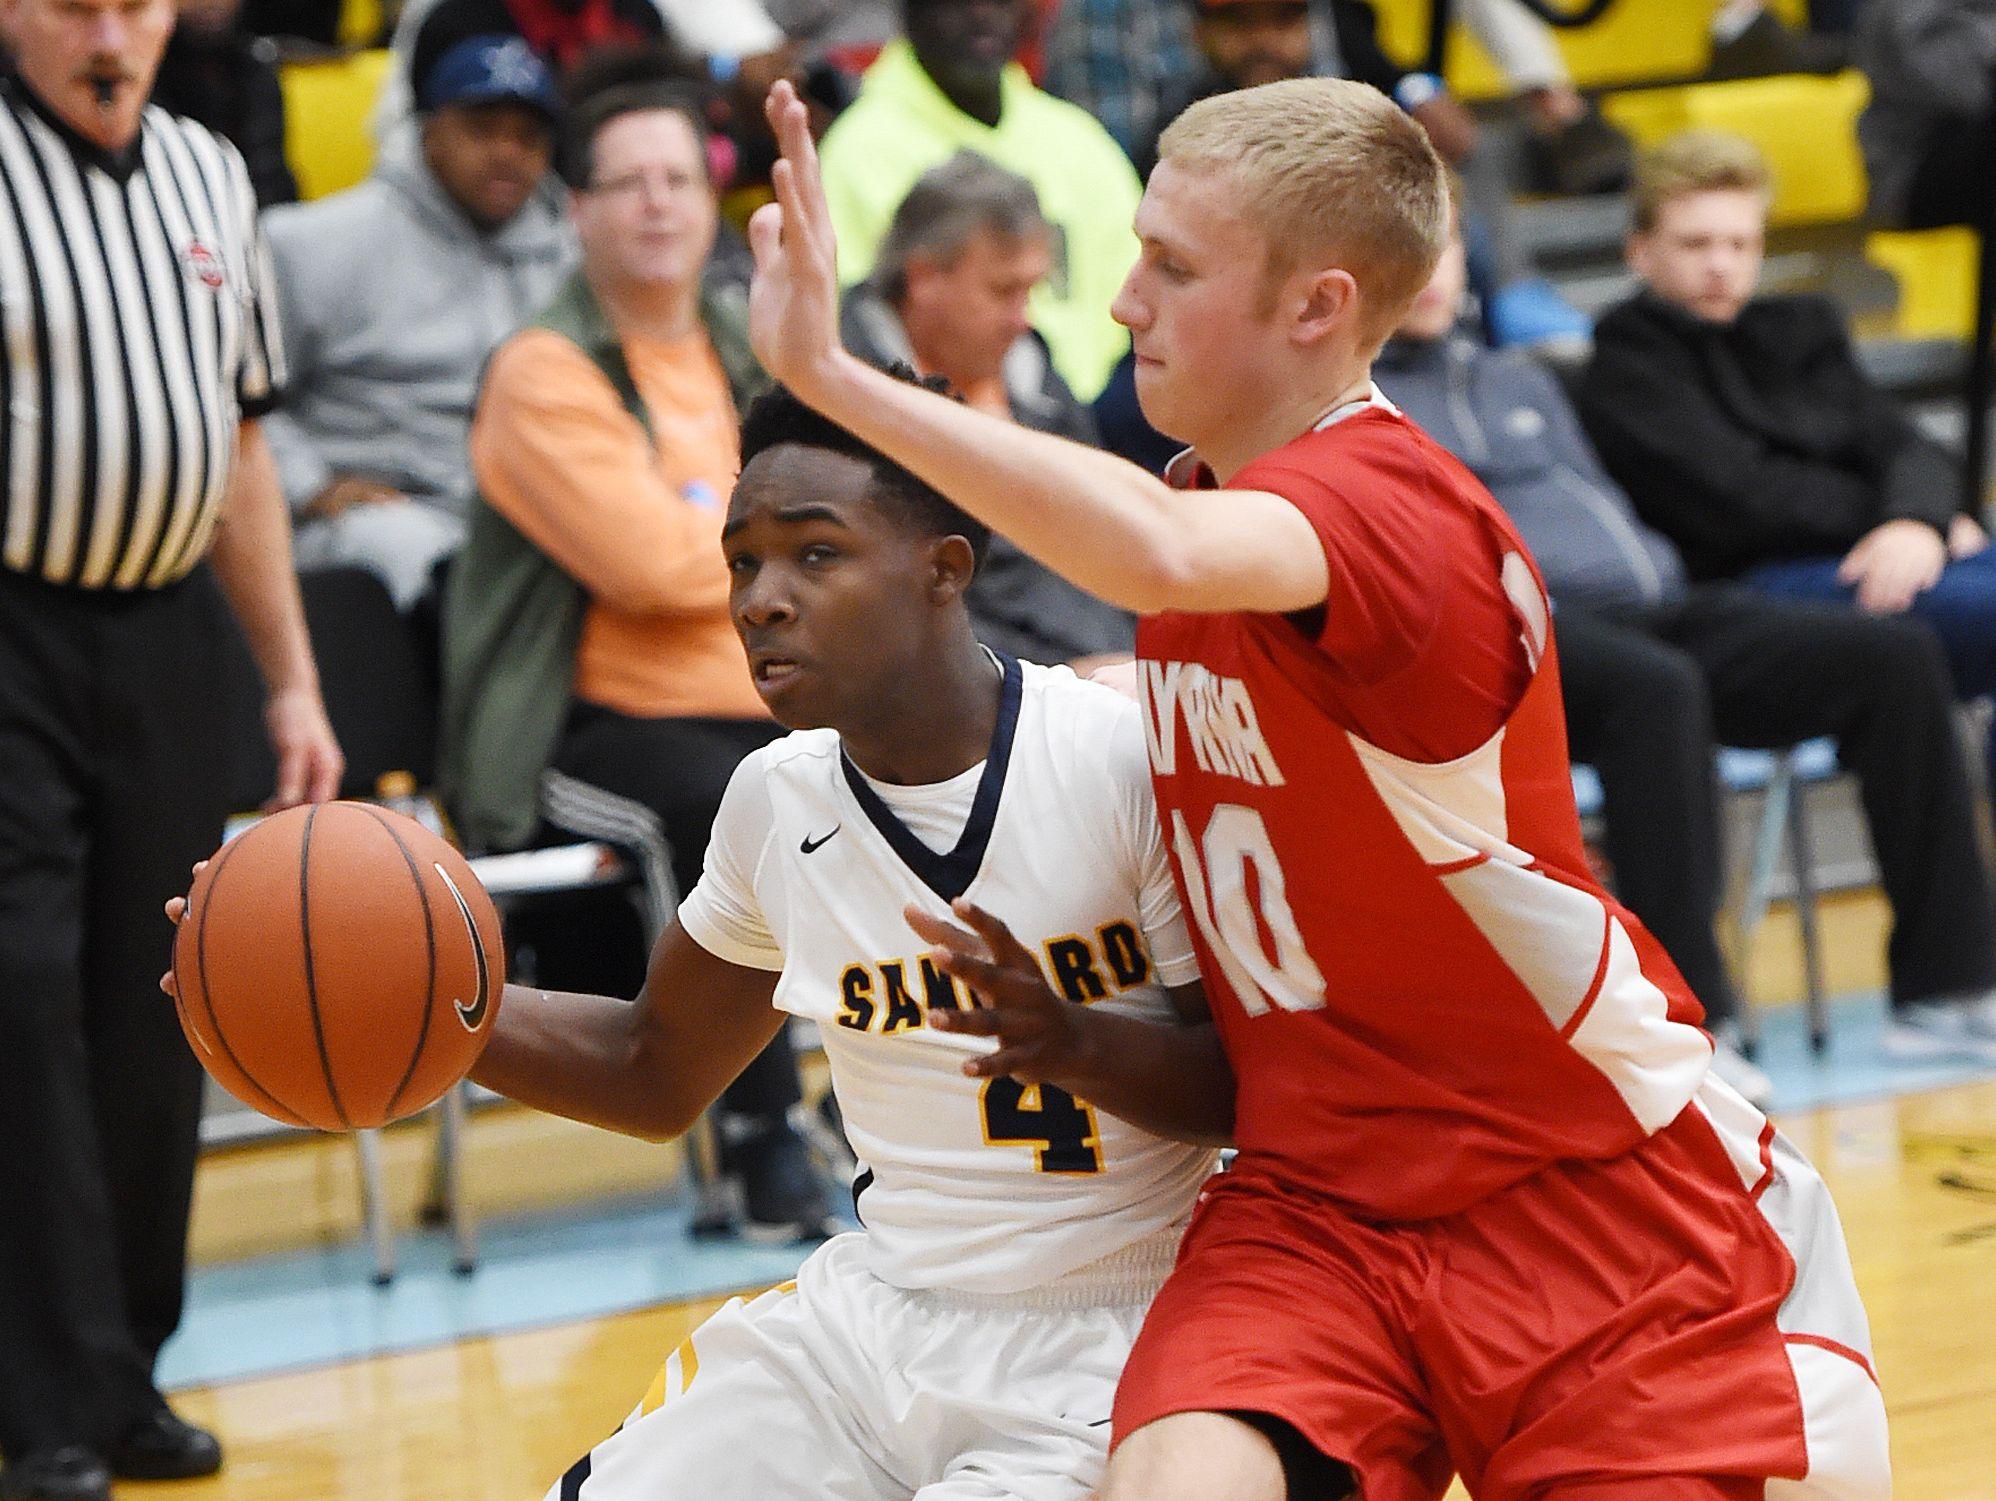 Sanford's Sean Williams (4) drives to the basket as Smyrna's Caleb Matthews defends.